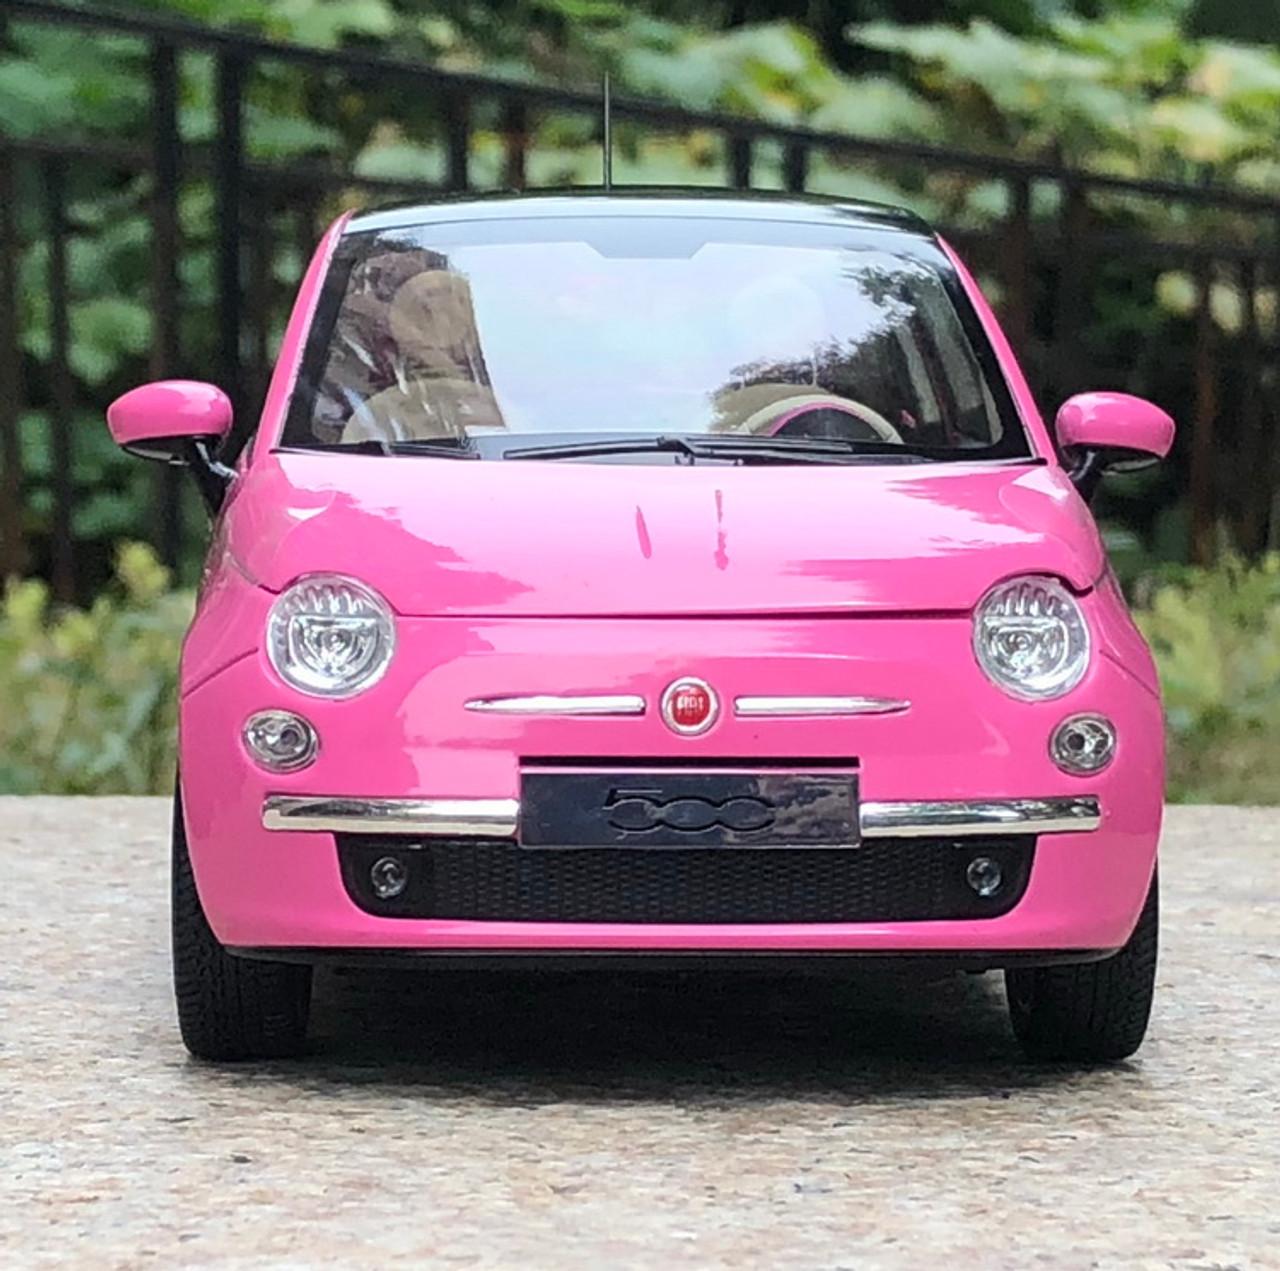 Fiat 500 1 2 Model From 2008 2015 Complete Alternator: 1/18 Norev Fiat 500 (Pink) Diecast Car Model